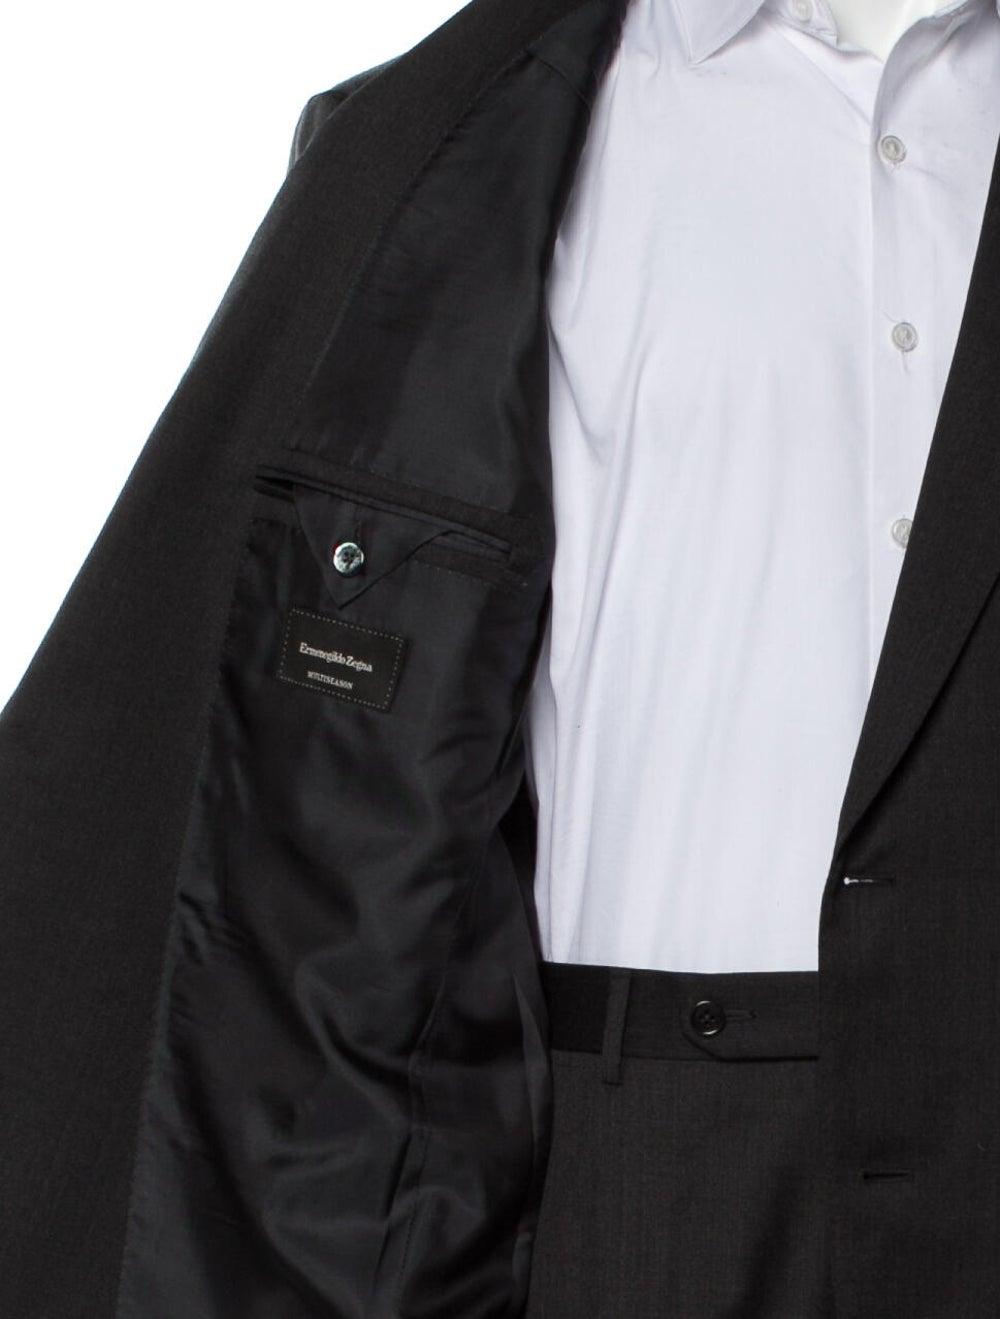 Ermenegildo Zegna Wool Two-Piece Suit Wool - image 5